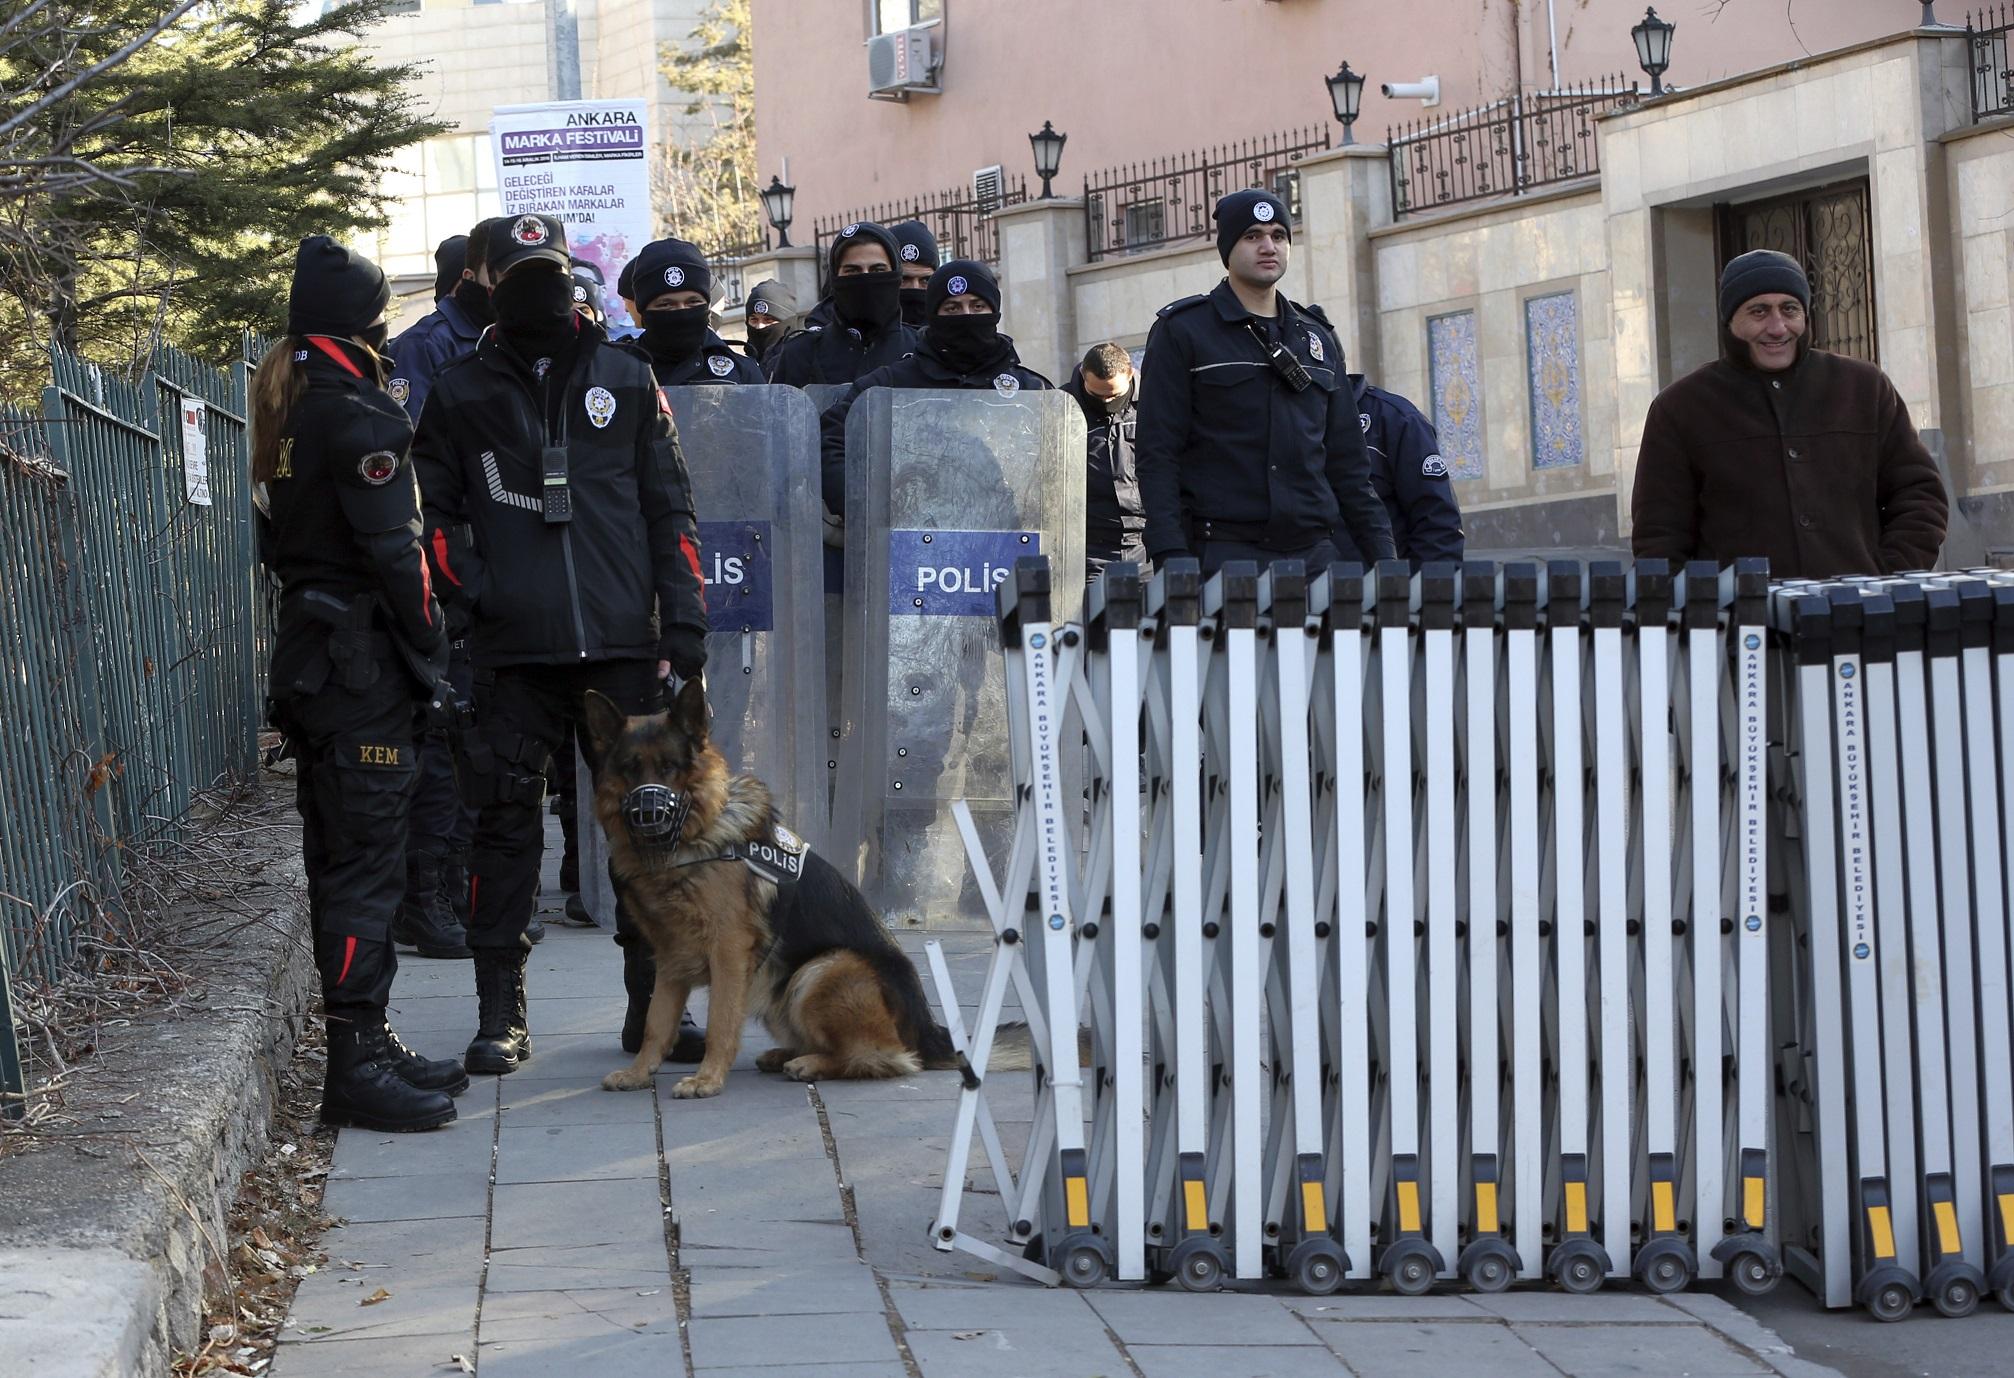 Turquie: Evacuation de l'ambassade d'Iran à Ankara en raison de la présence d'un Kamikaze